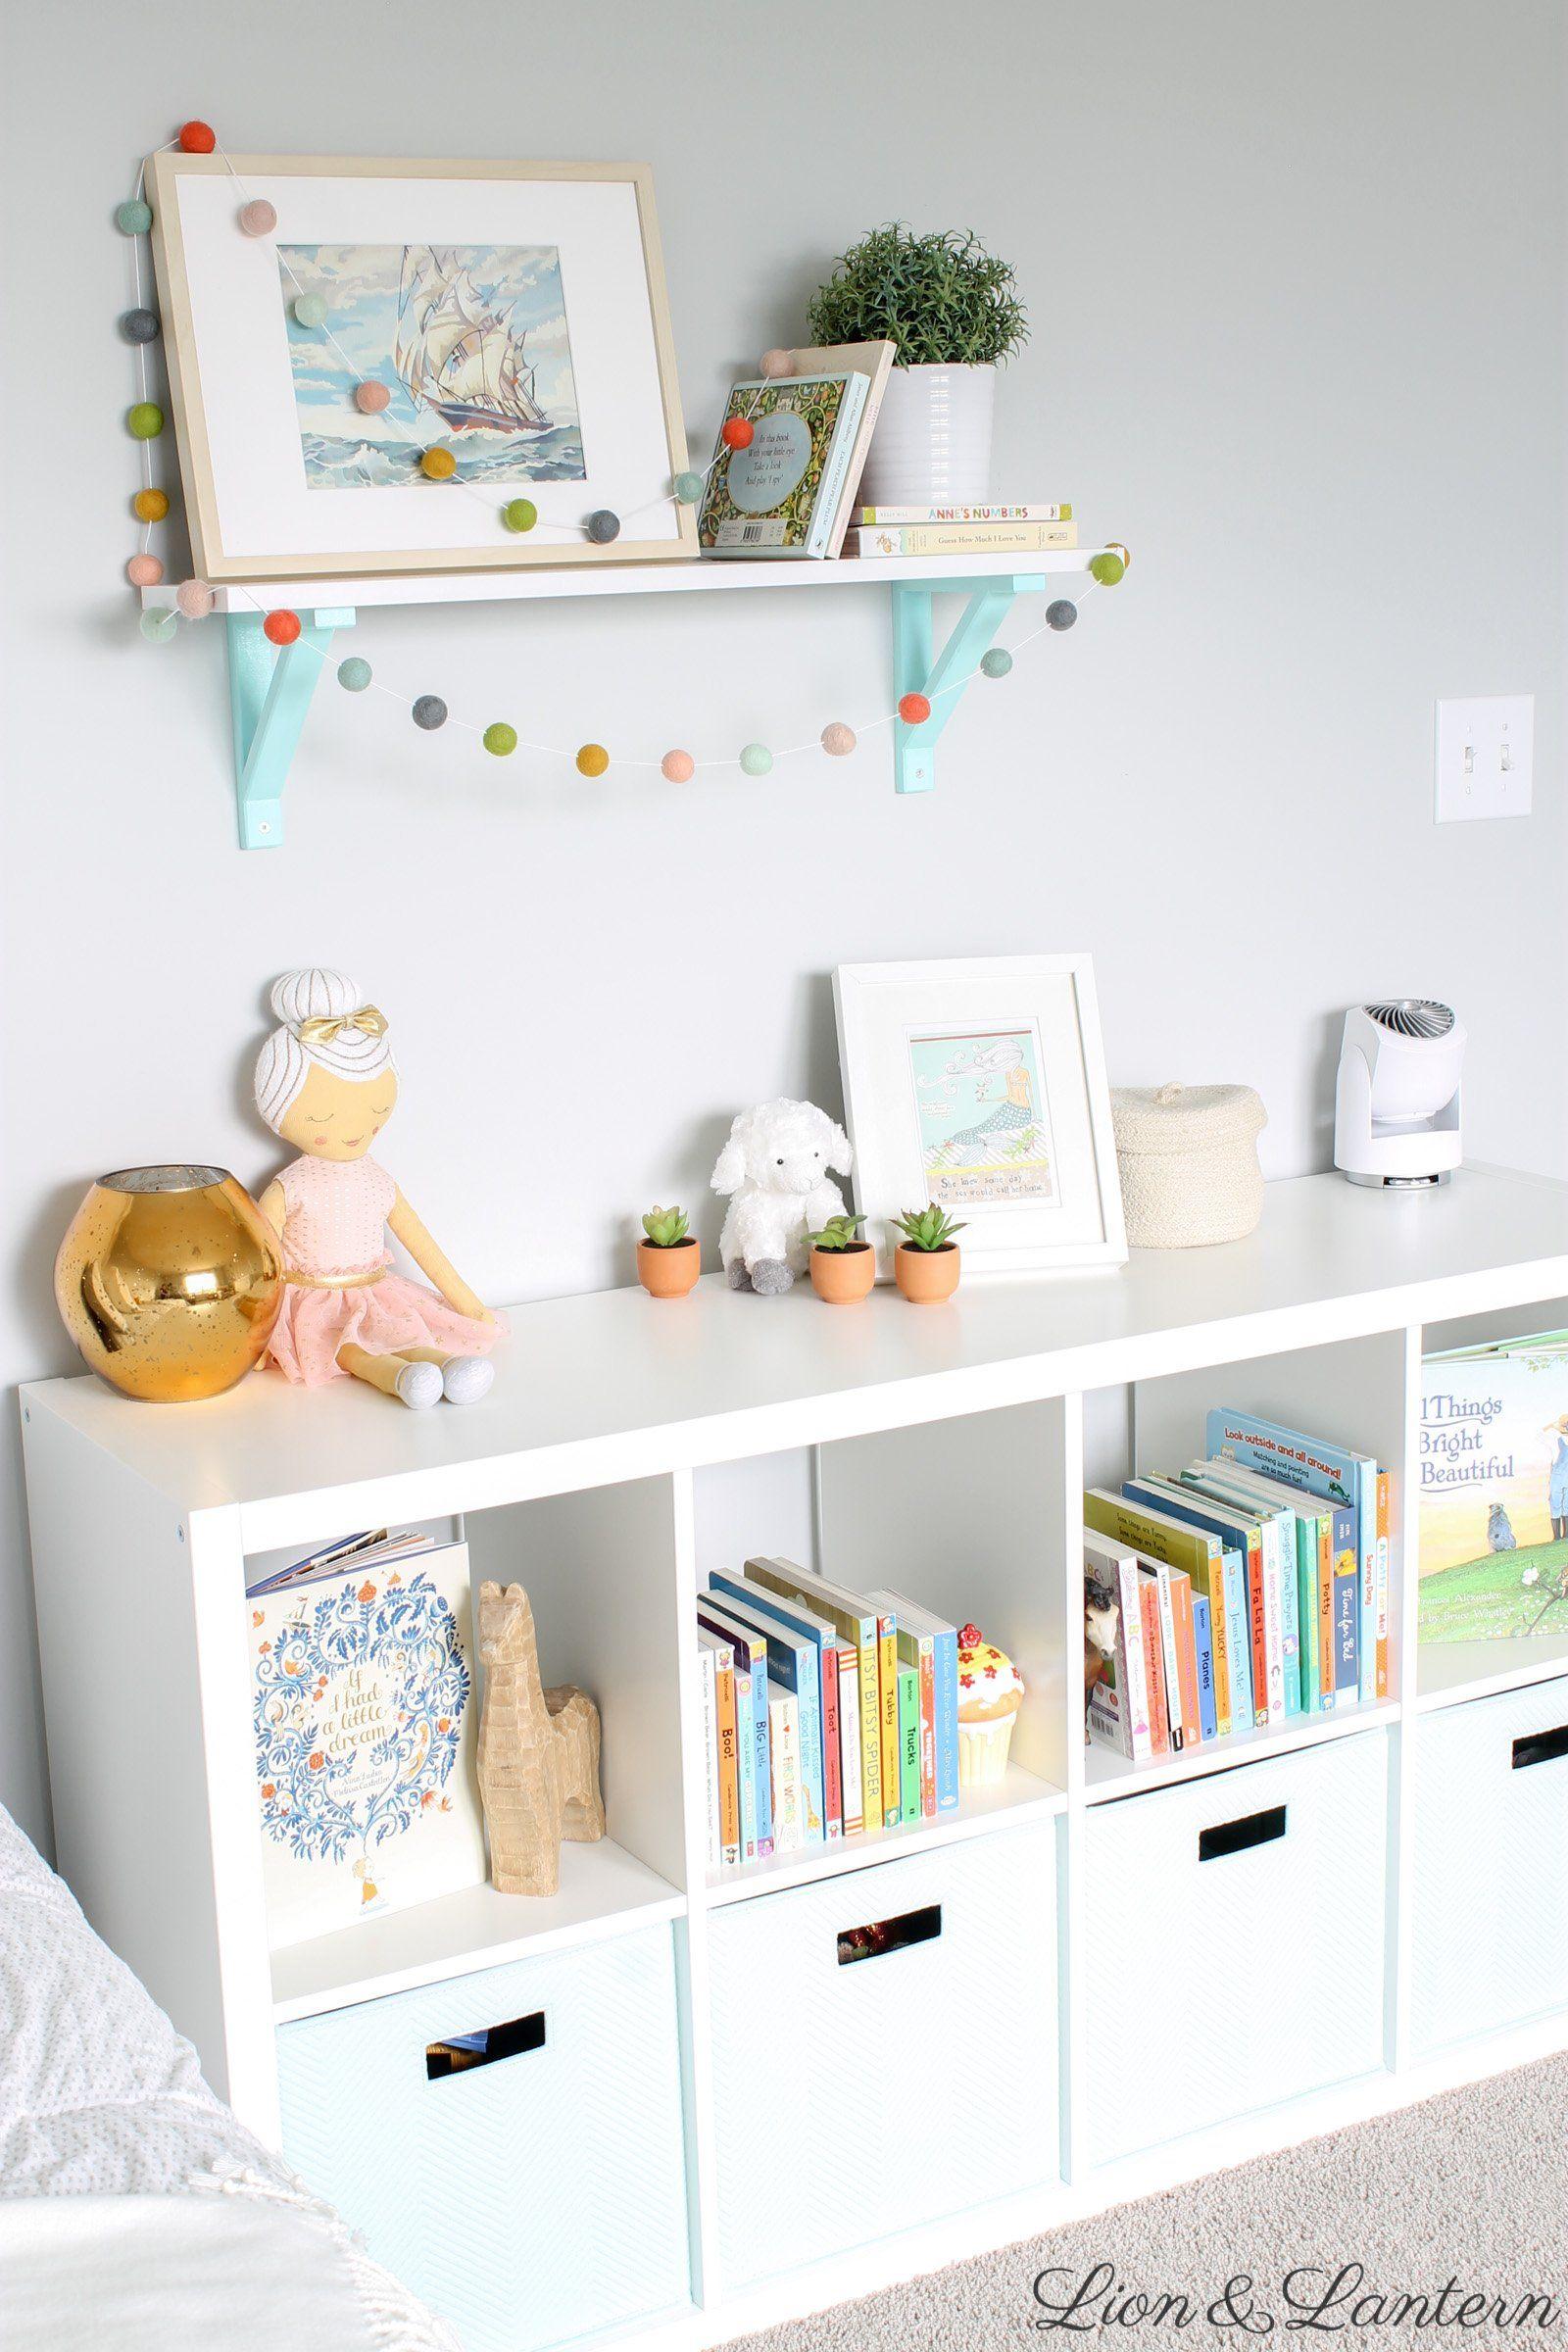 31 Genius Ikea Kallax Hacks To Organize Your Entire Home Ikea Kids Room Ikea Kids Bedroom Kids Room Wall Ikea kallax ideas bedroom